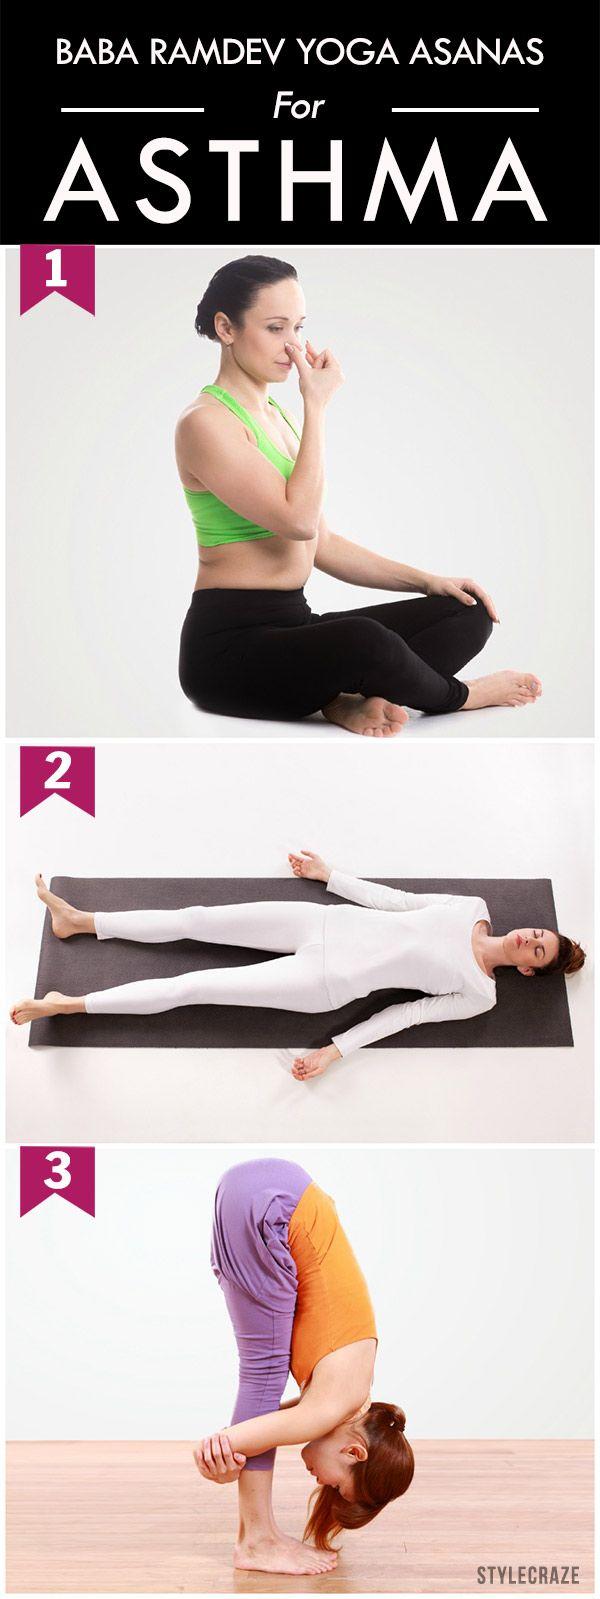 7 Baba Ramdev Yoga Asanas To Treat Asthma | Baba ramdev yoga, Baba ...